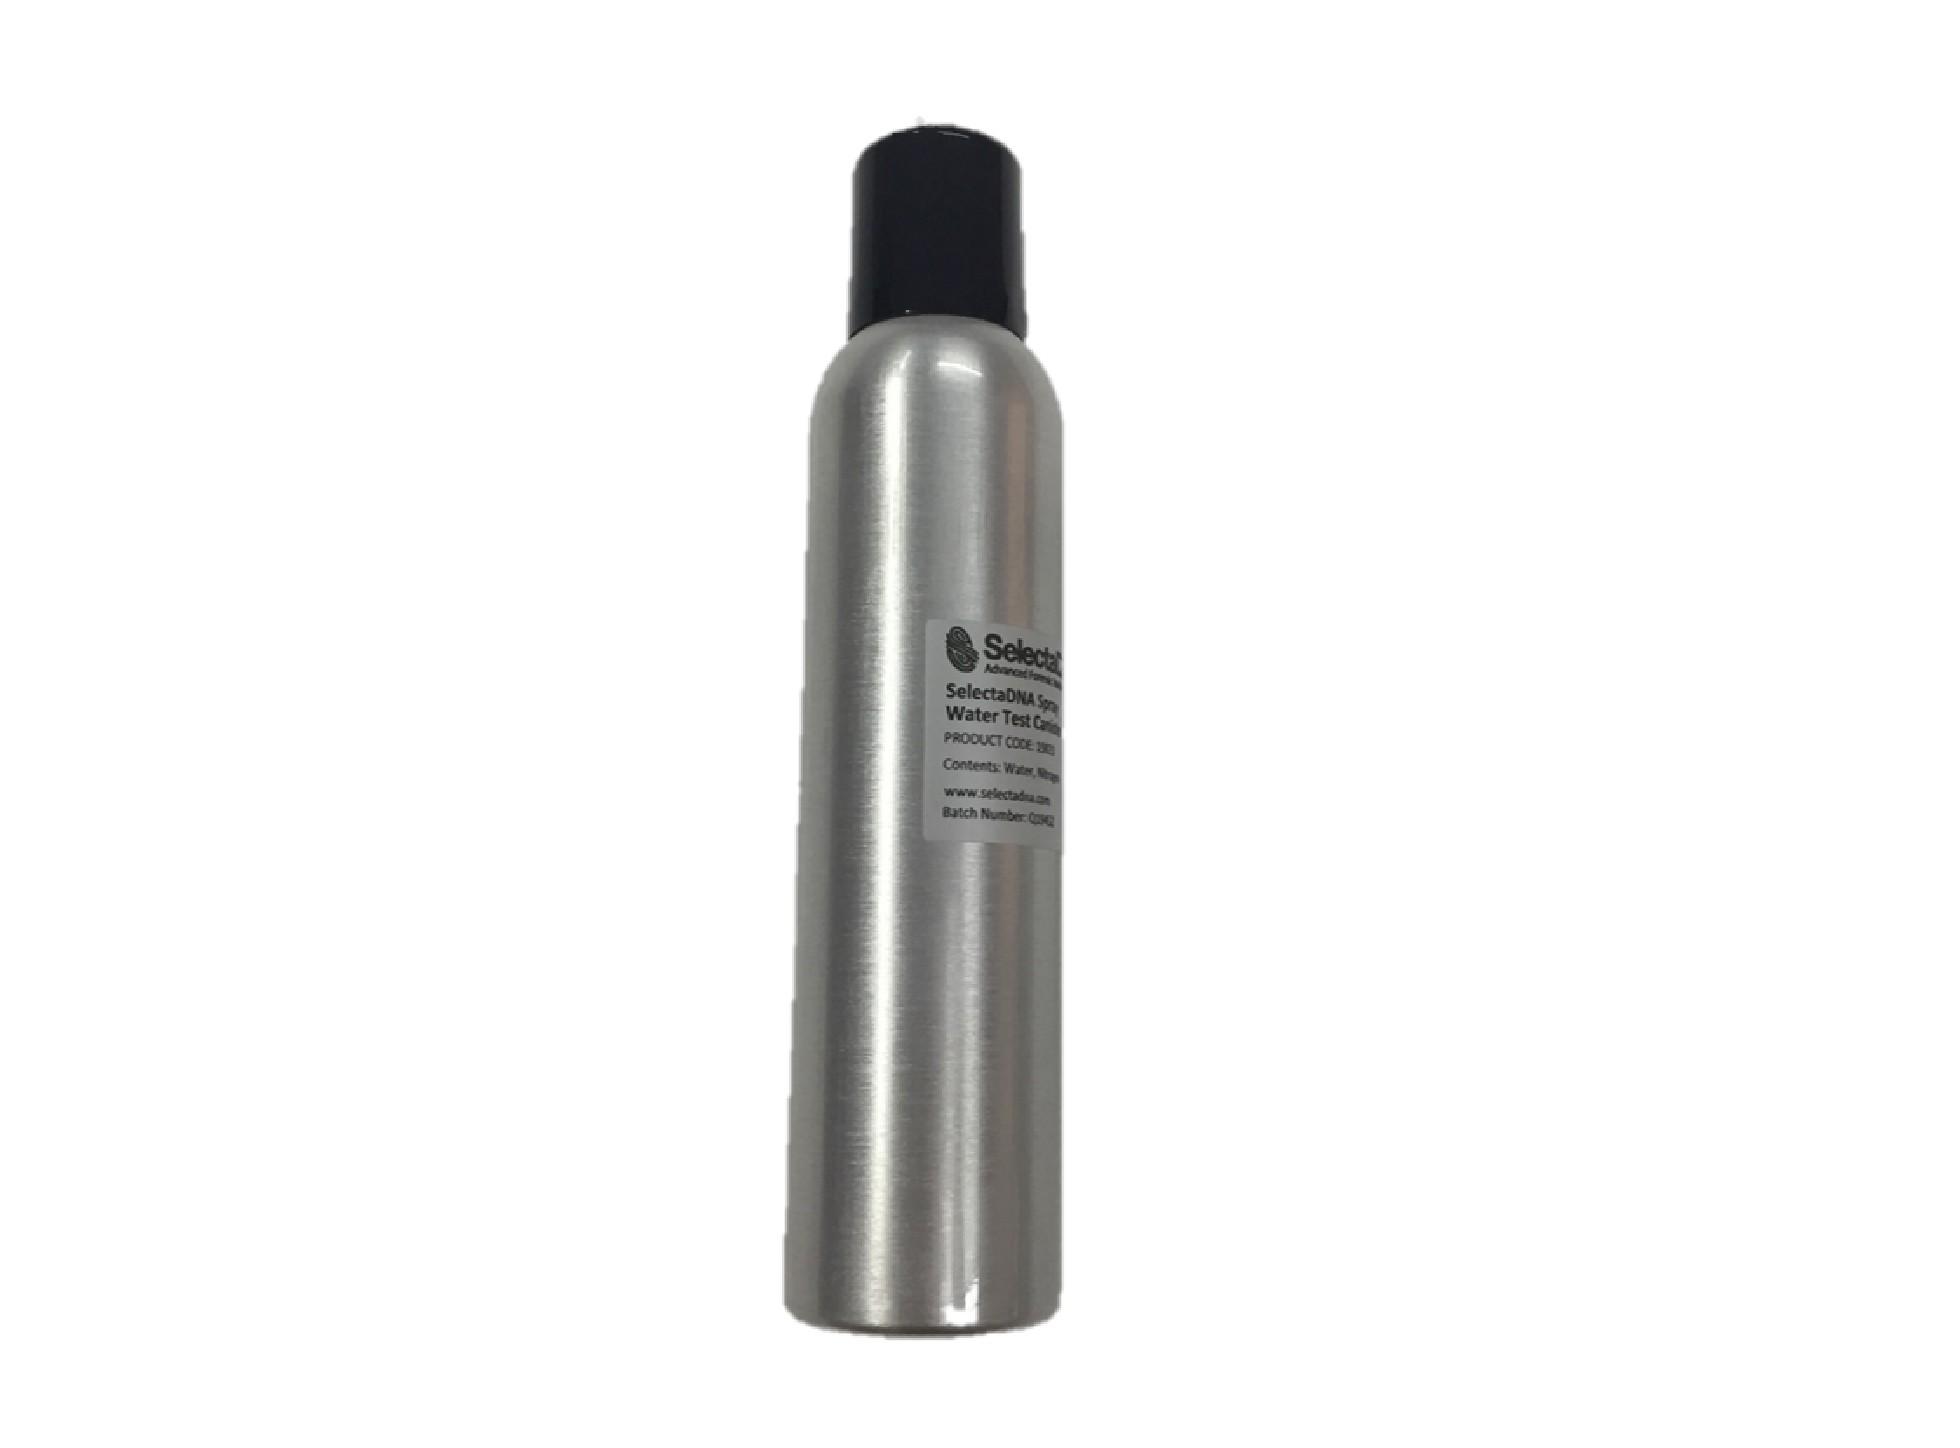 SelectaDNA Aerosol (Water)